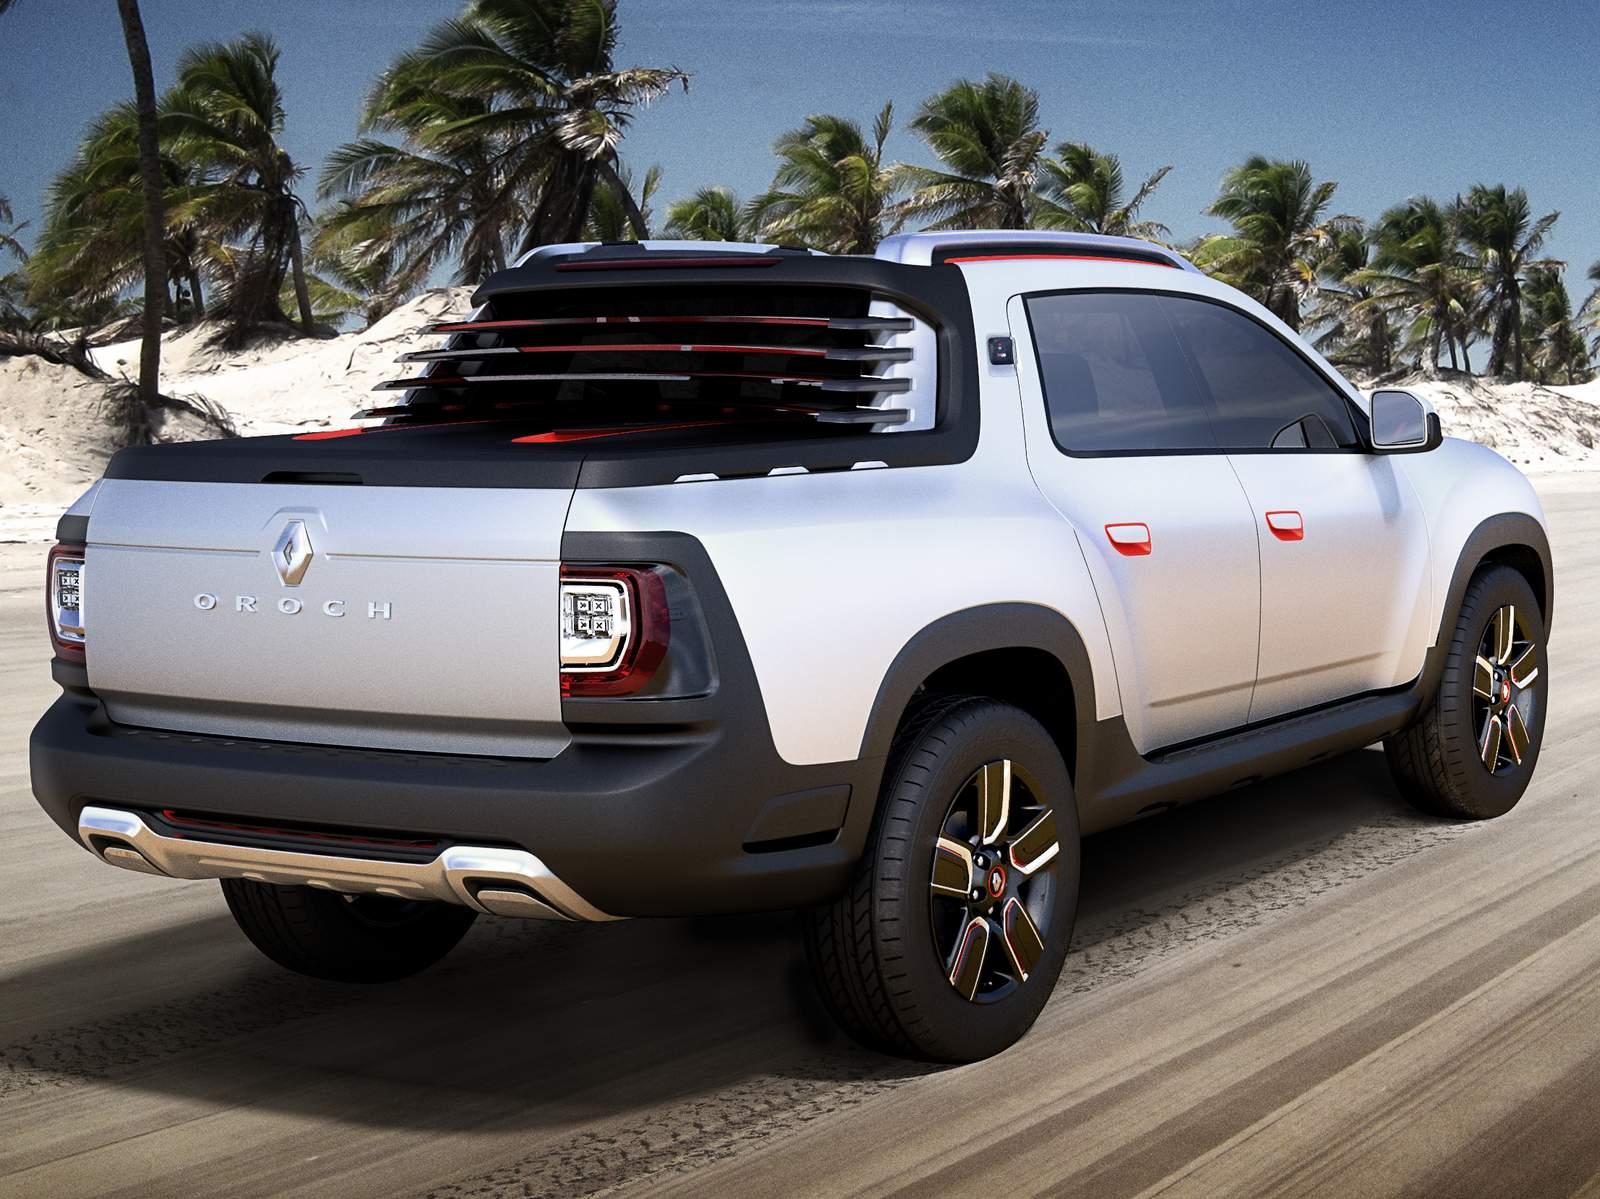 renault duster oroch pick up apresentada como conceito car blog br carros. Black Bedroom Furniture Sets. Home Design Ideas